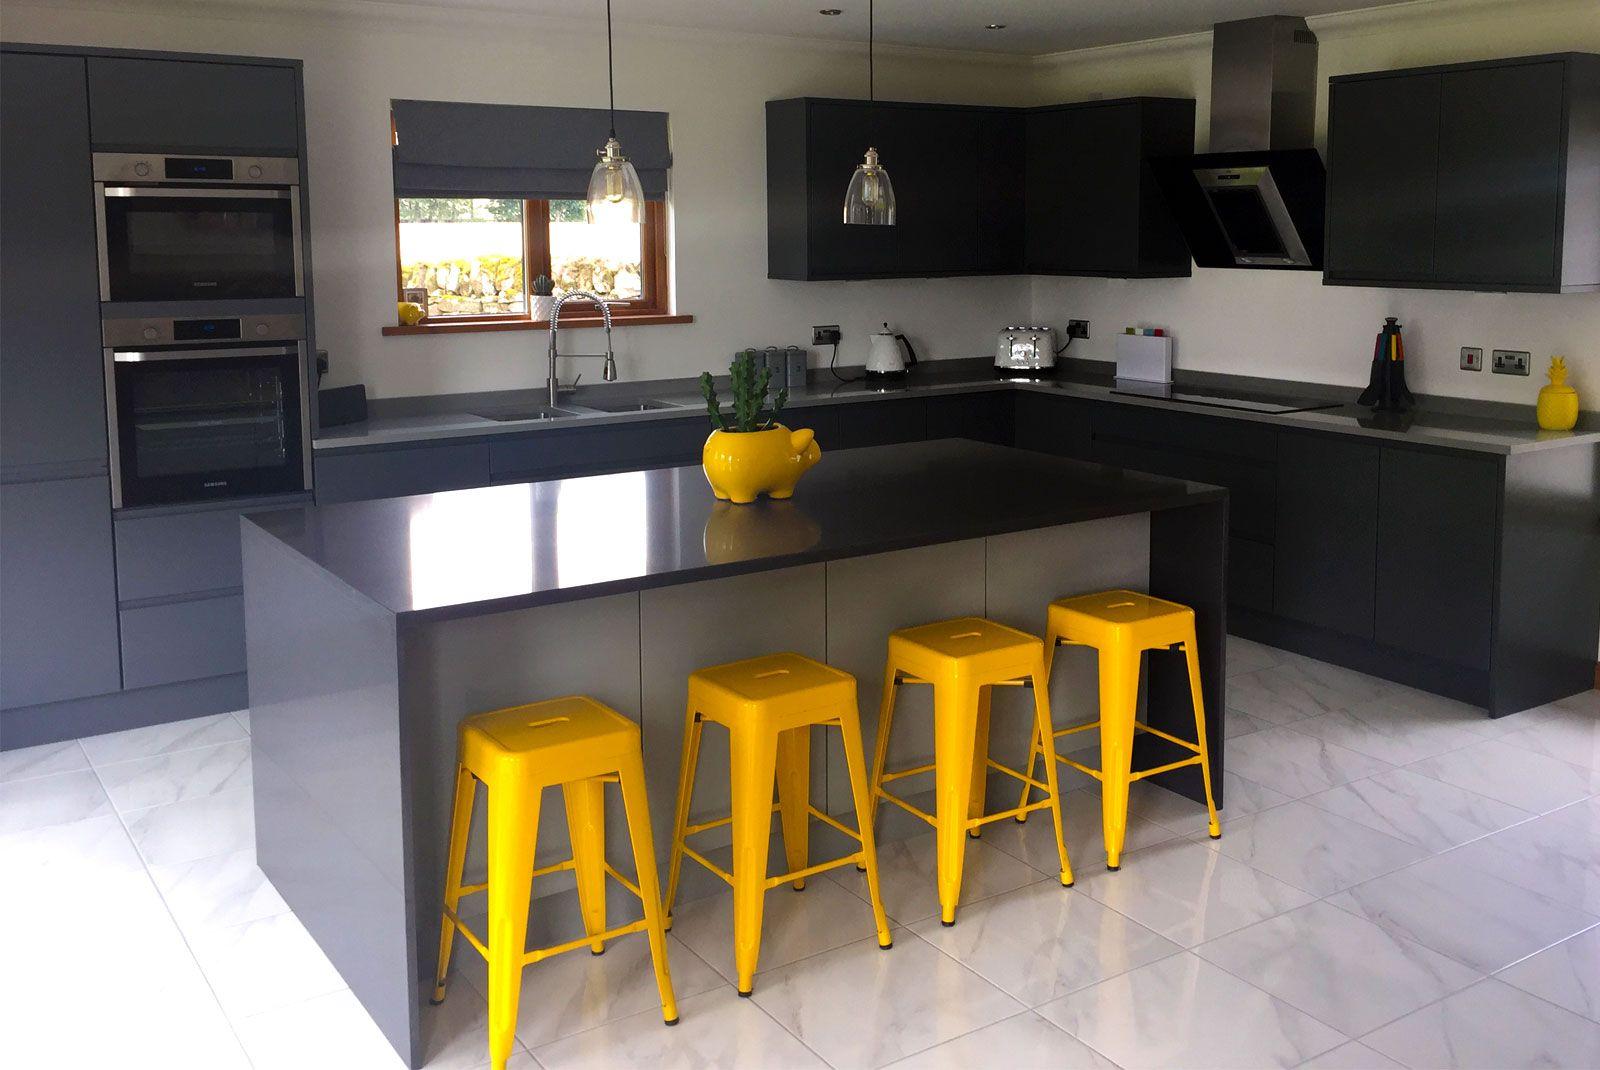 An Innova Luca Graphite Handelless Modern Kitchen in 2019